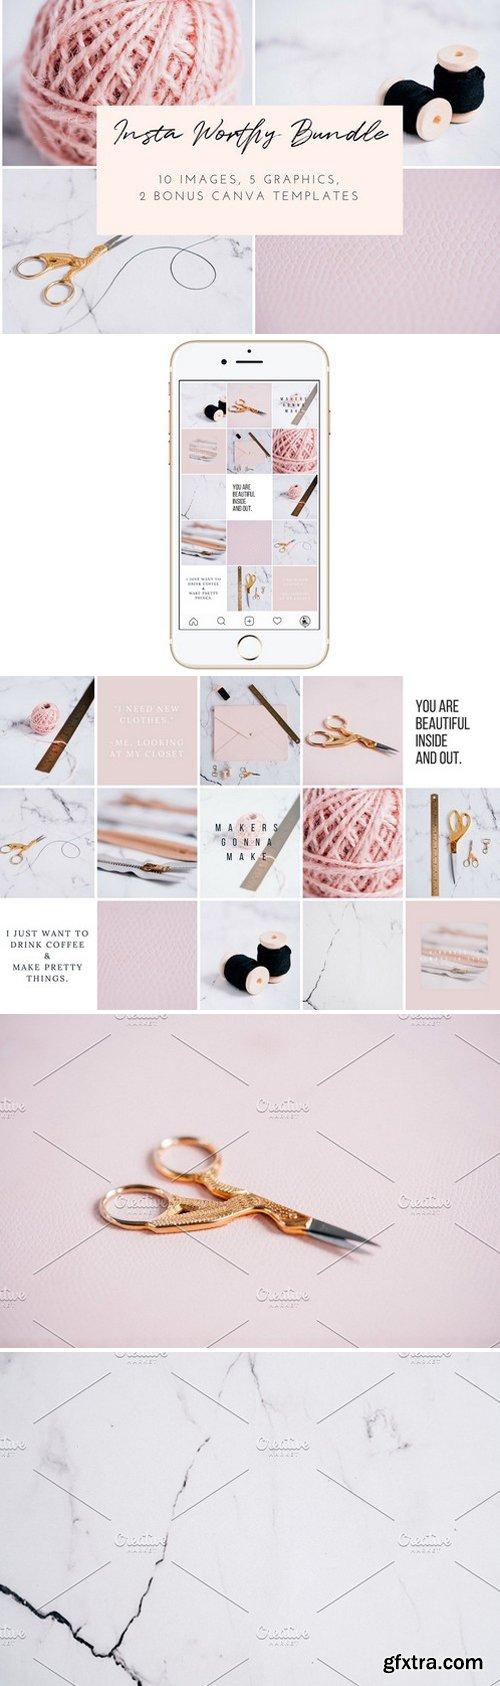 CM - Styled Photos | Maker 2 2358618